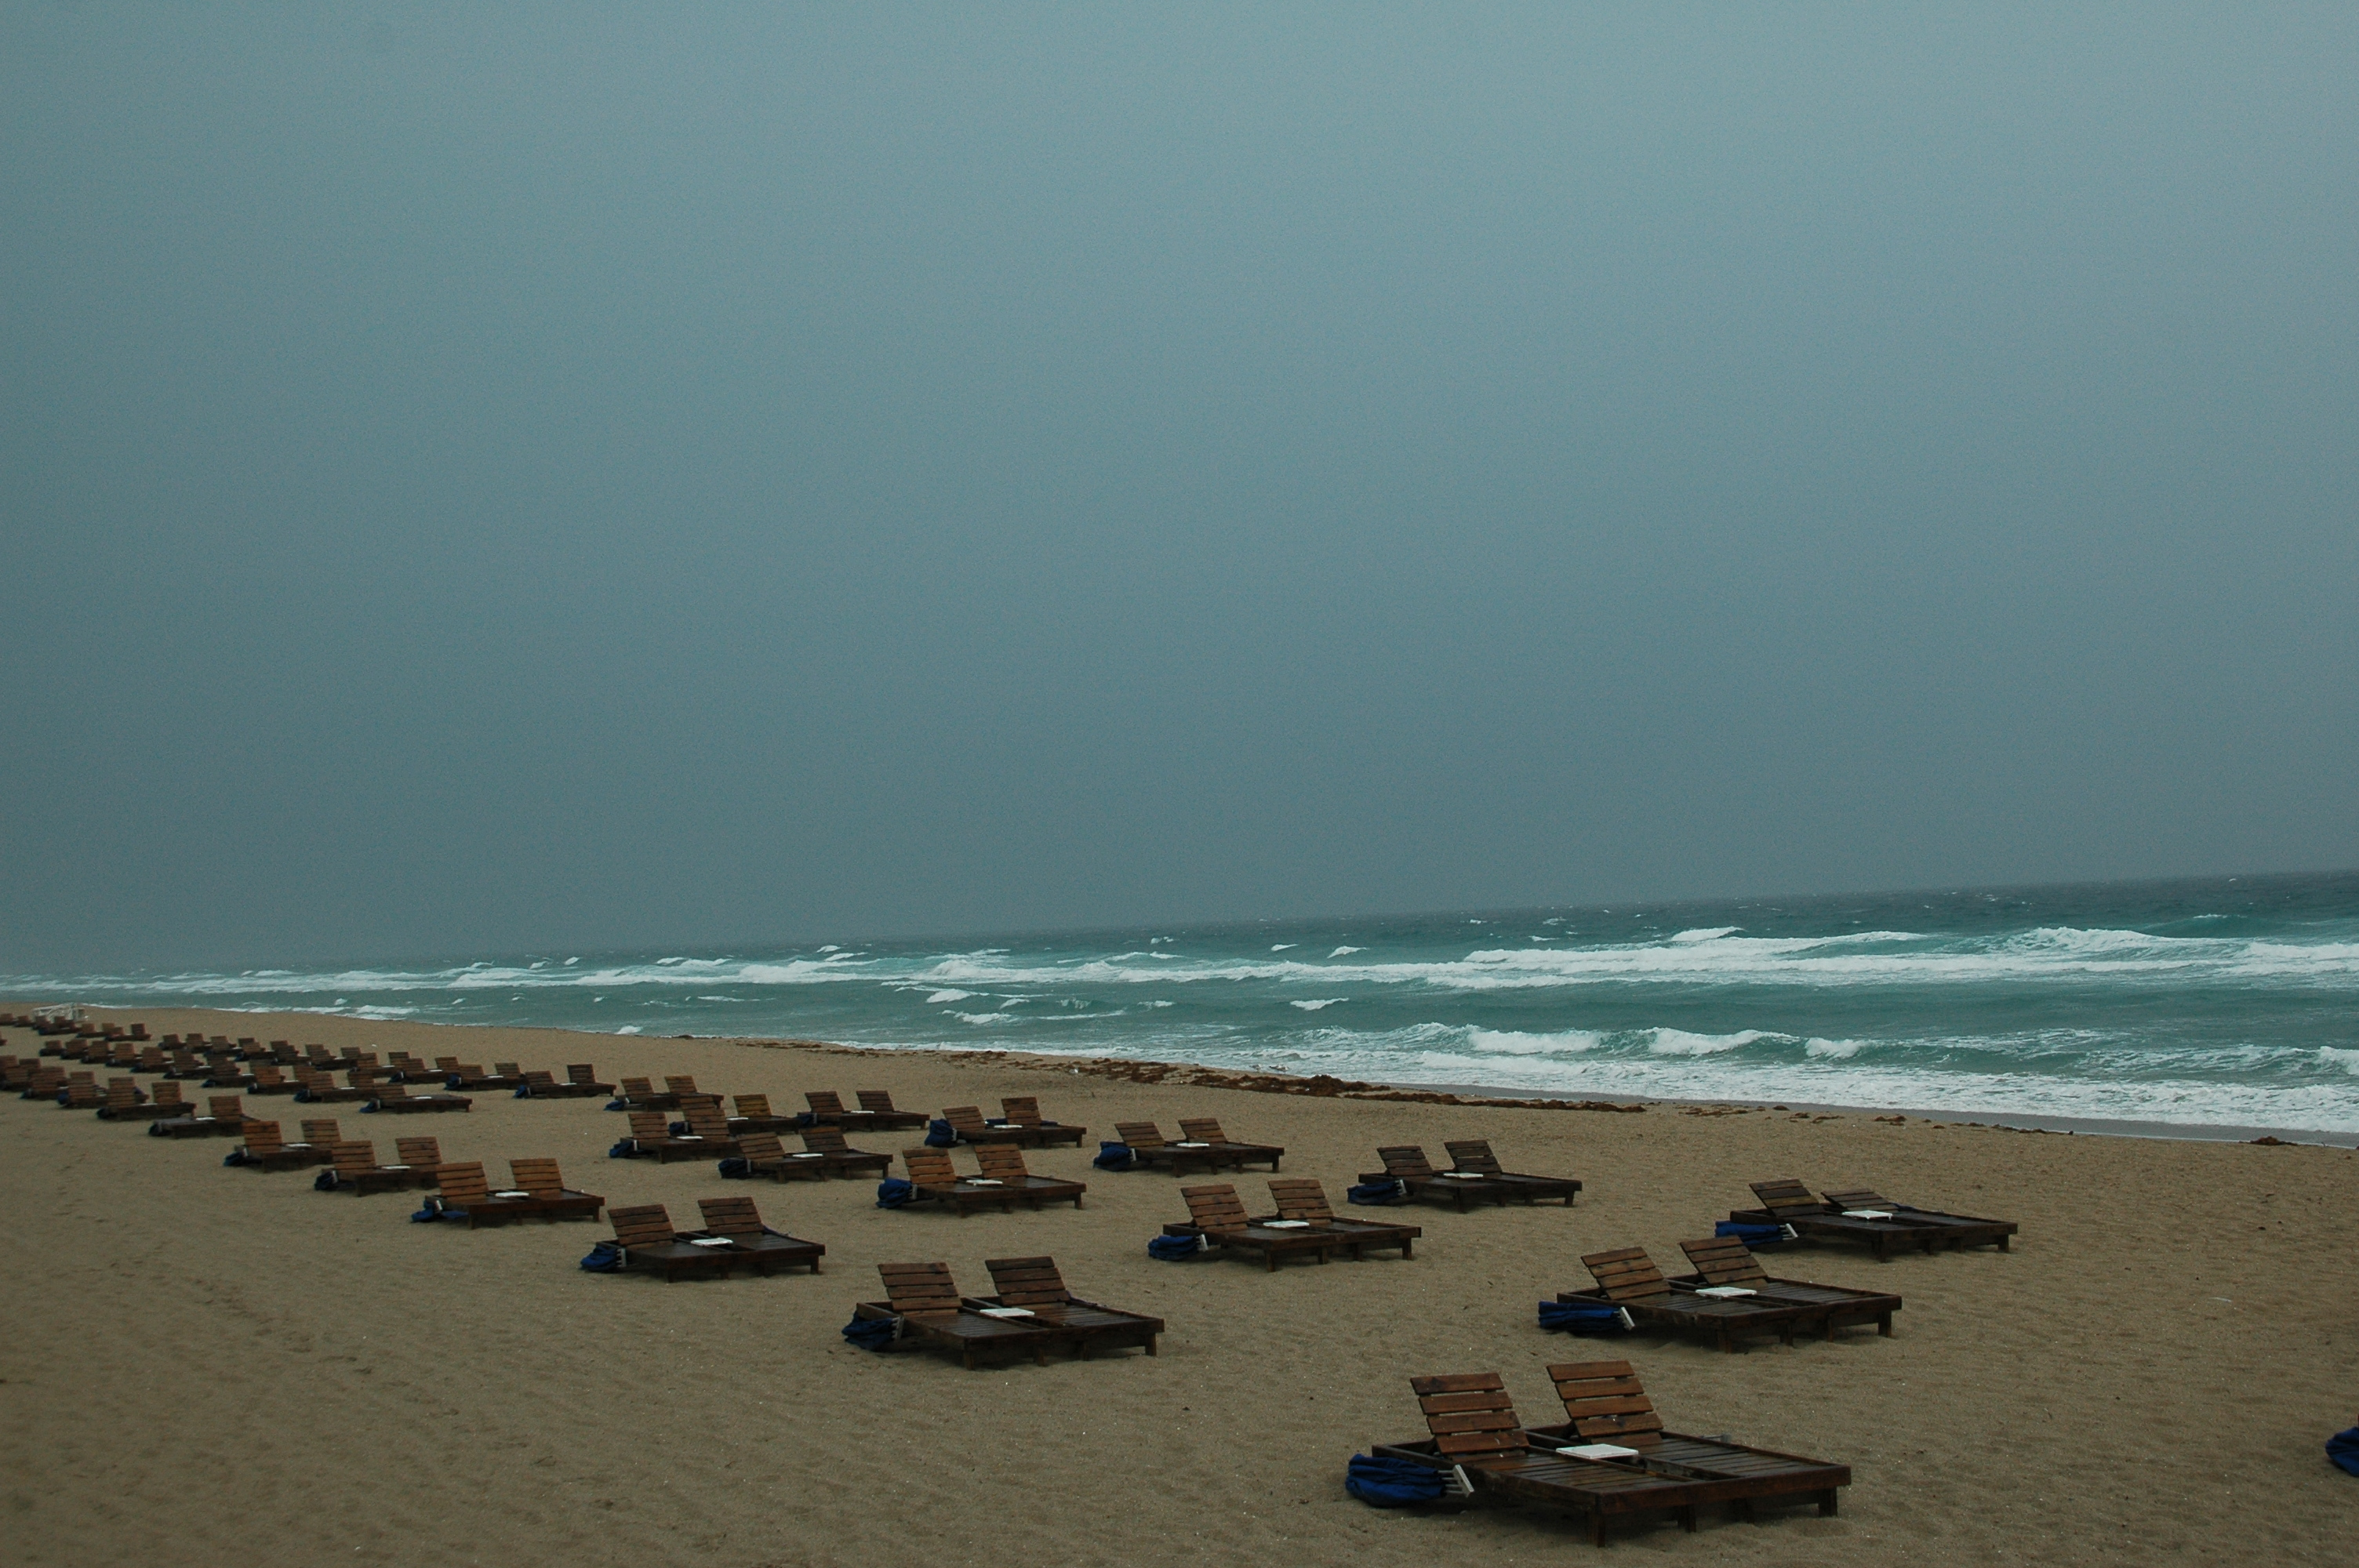 Joe Dobrow photo of empty beach lounges at Delray Beach, Florida